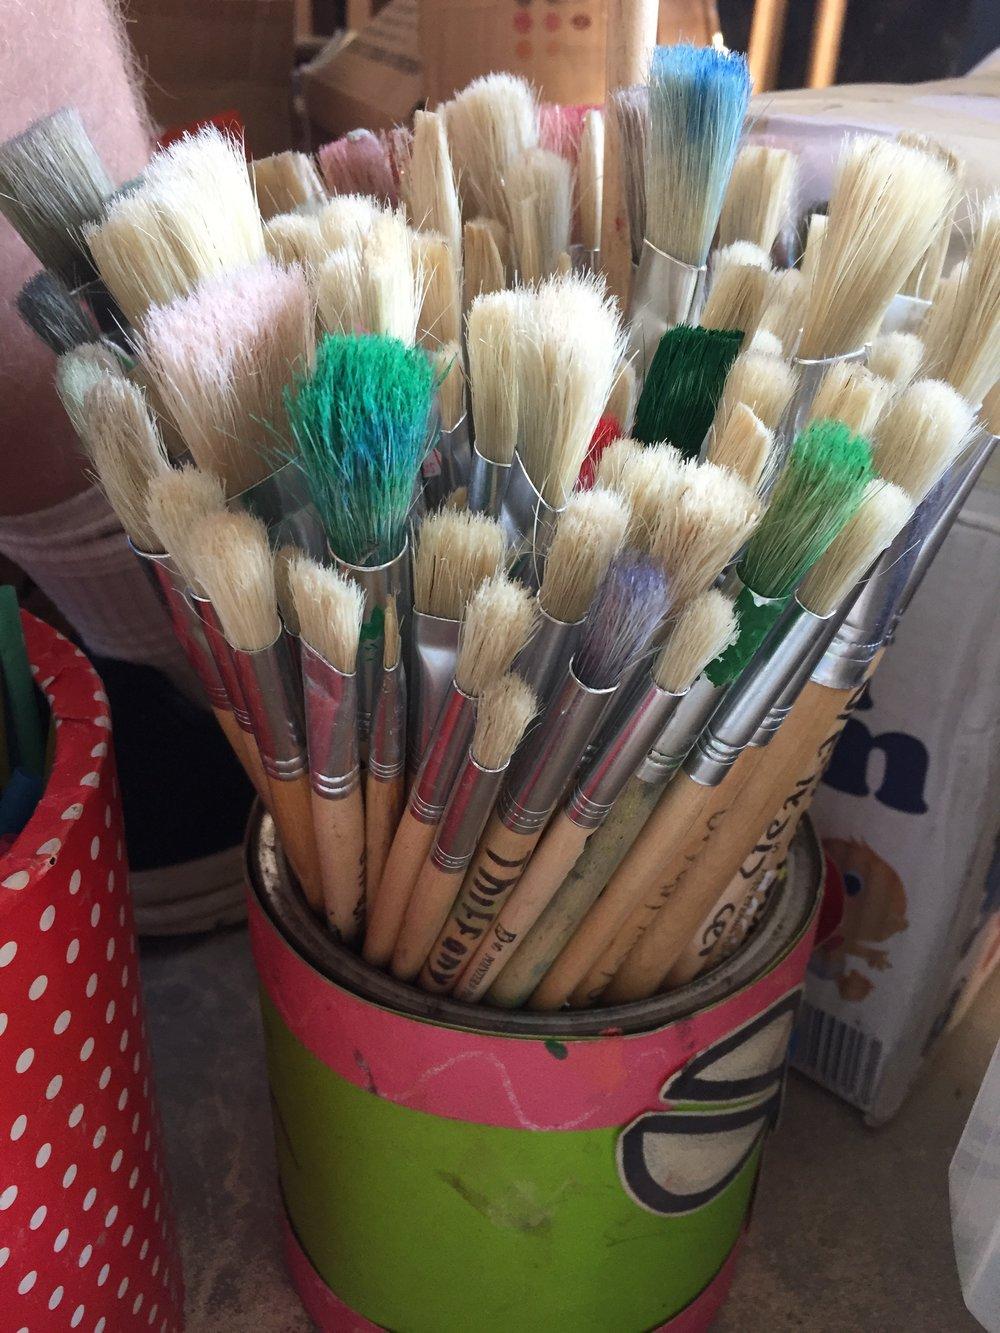 Paint brushes - Copy.jpg